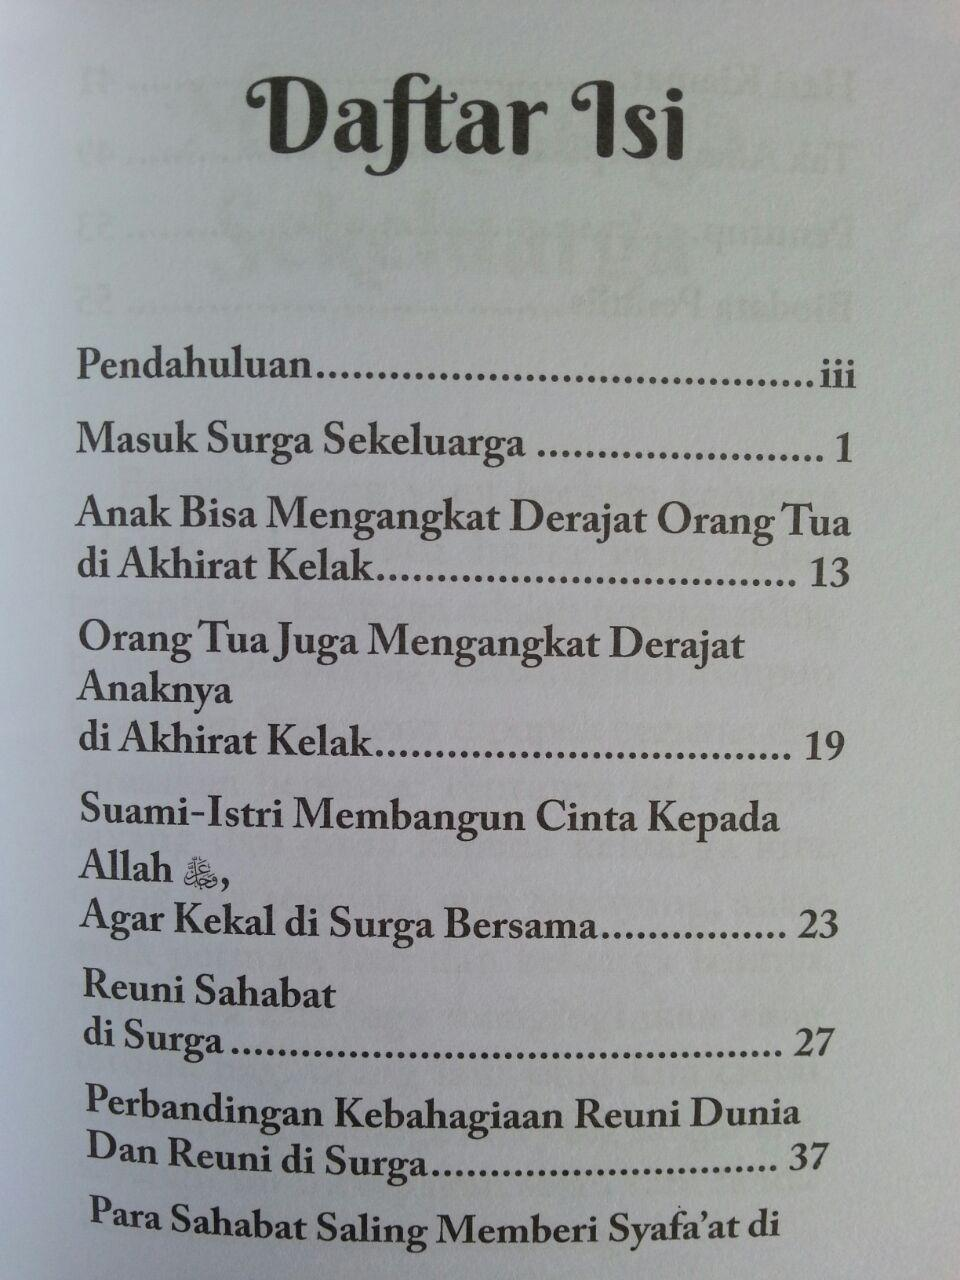 Buku Saku Masuk Surga Sekeluarga Reuni Sahabat Di Surga isi 2